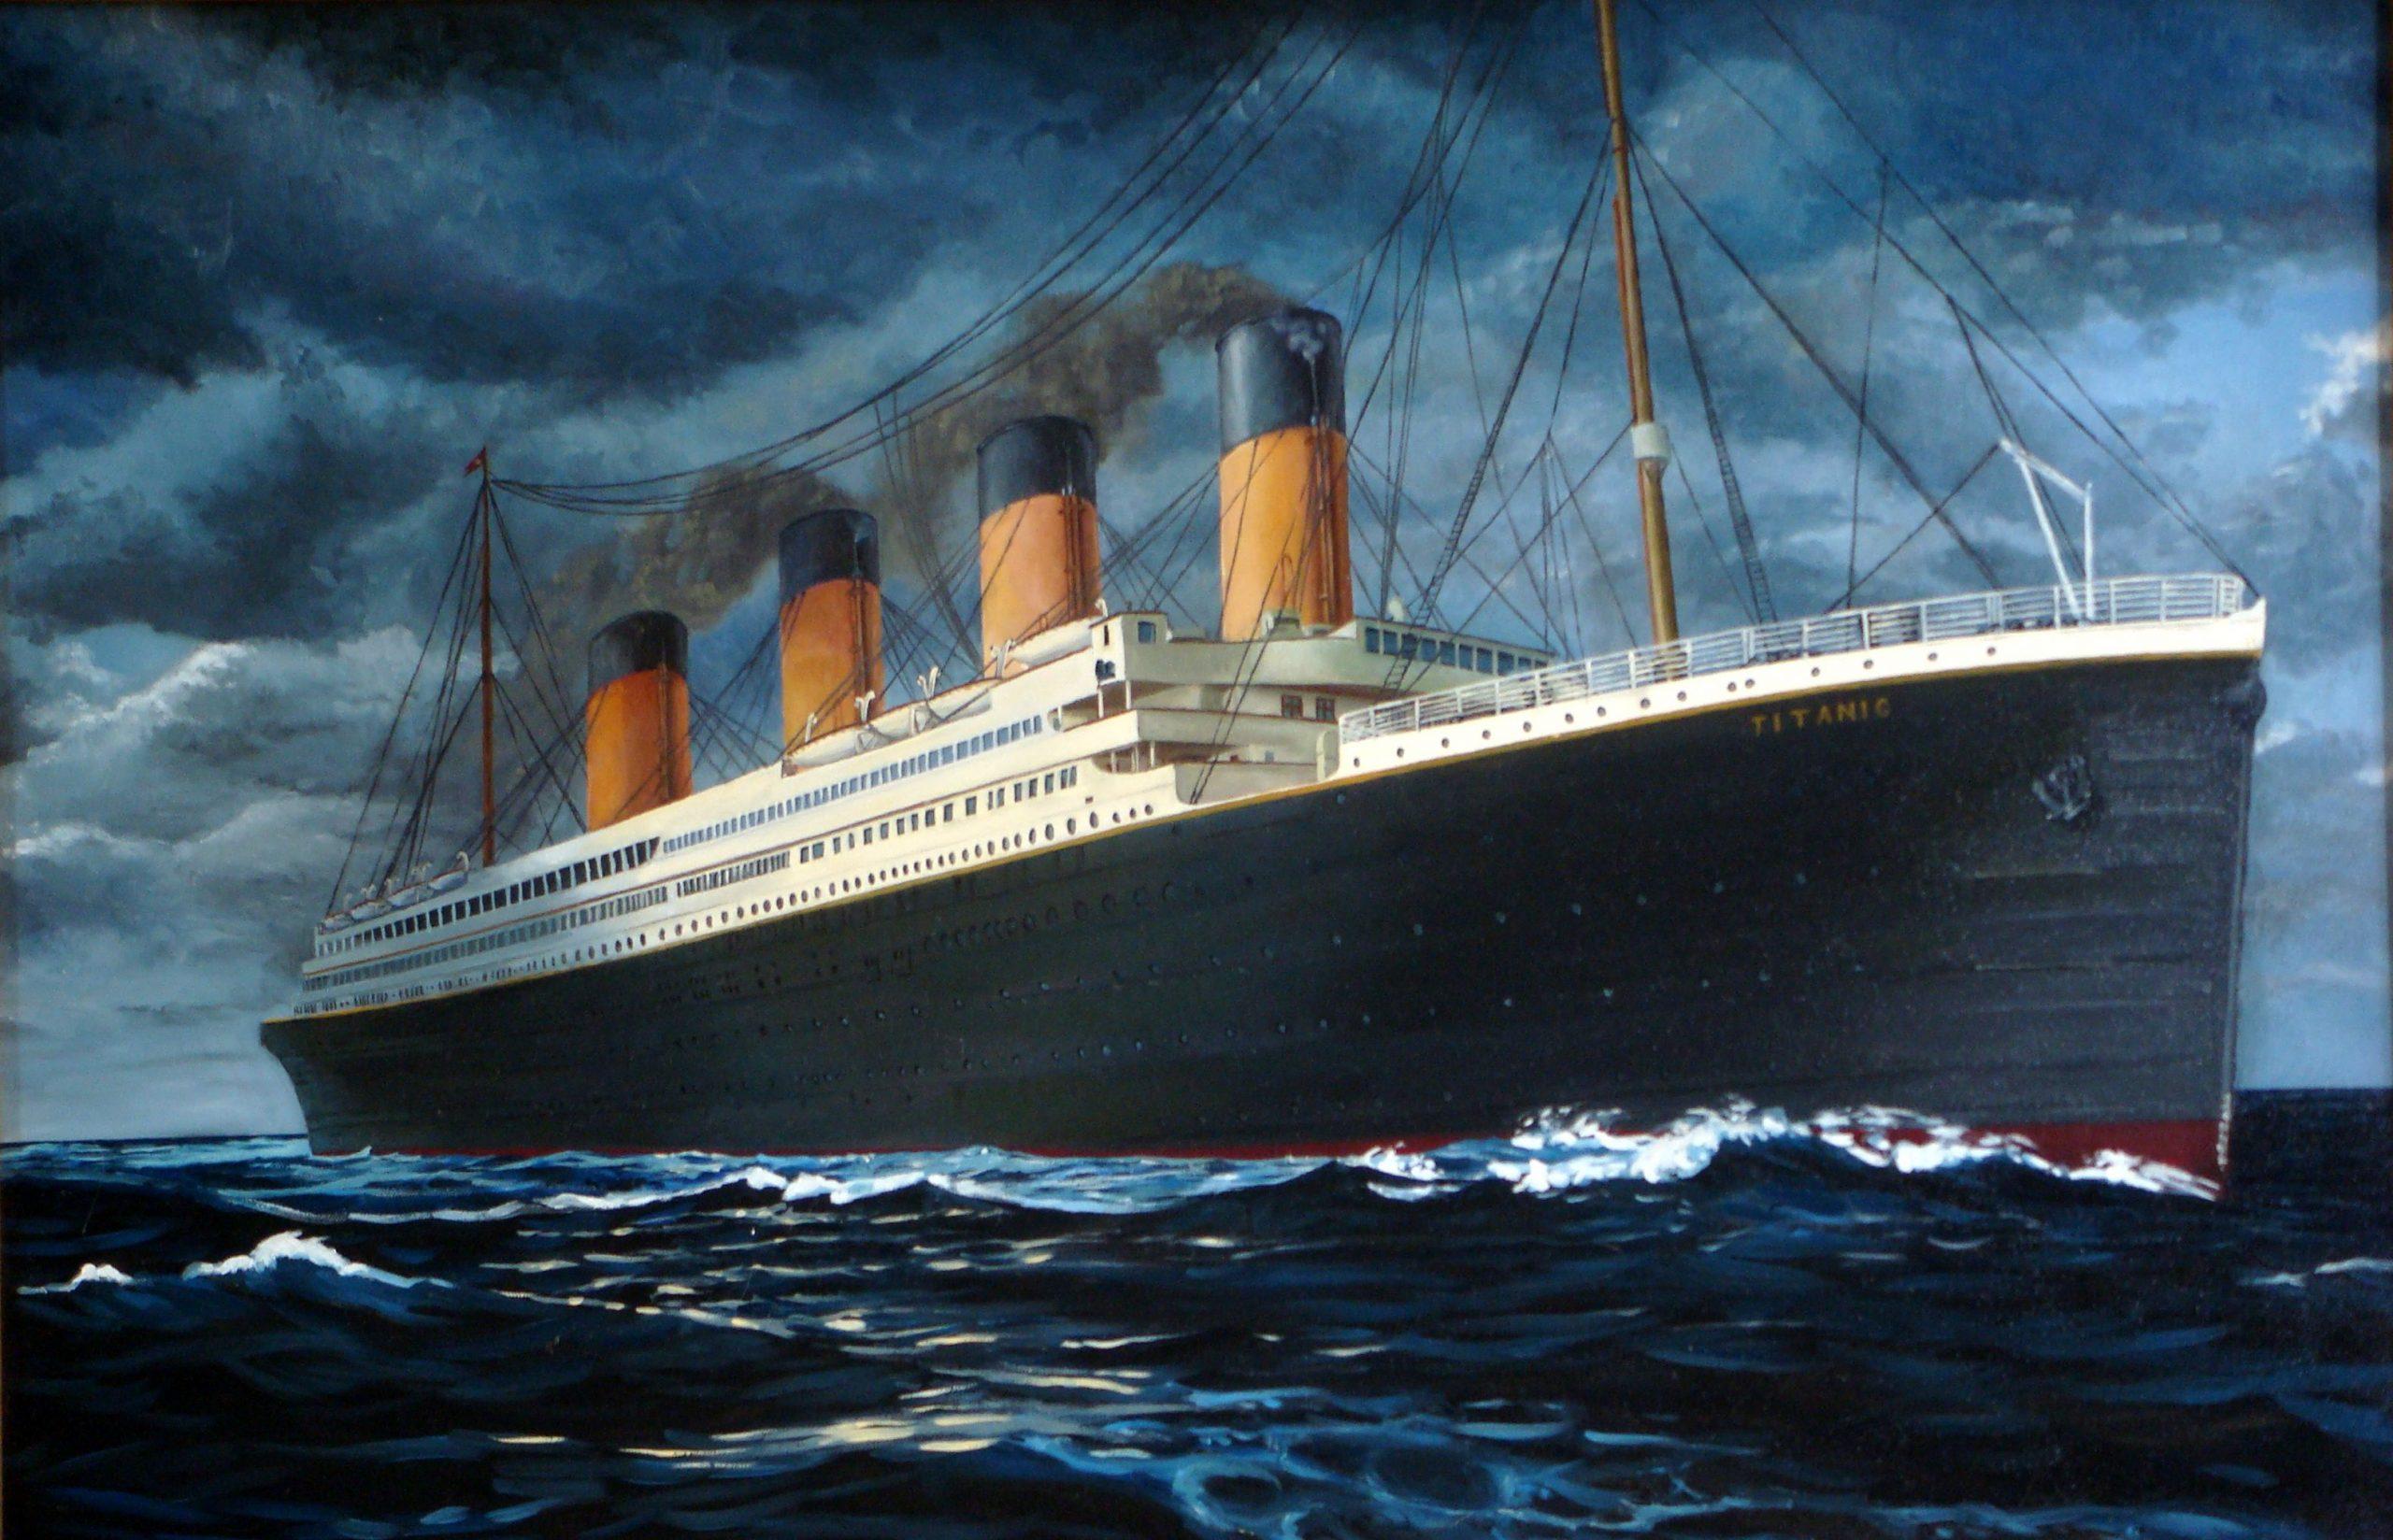 Titanic | Titanic | Dessin De Bateau, Bateau Titanic, Film tout Paquebot Dessin